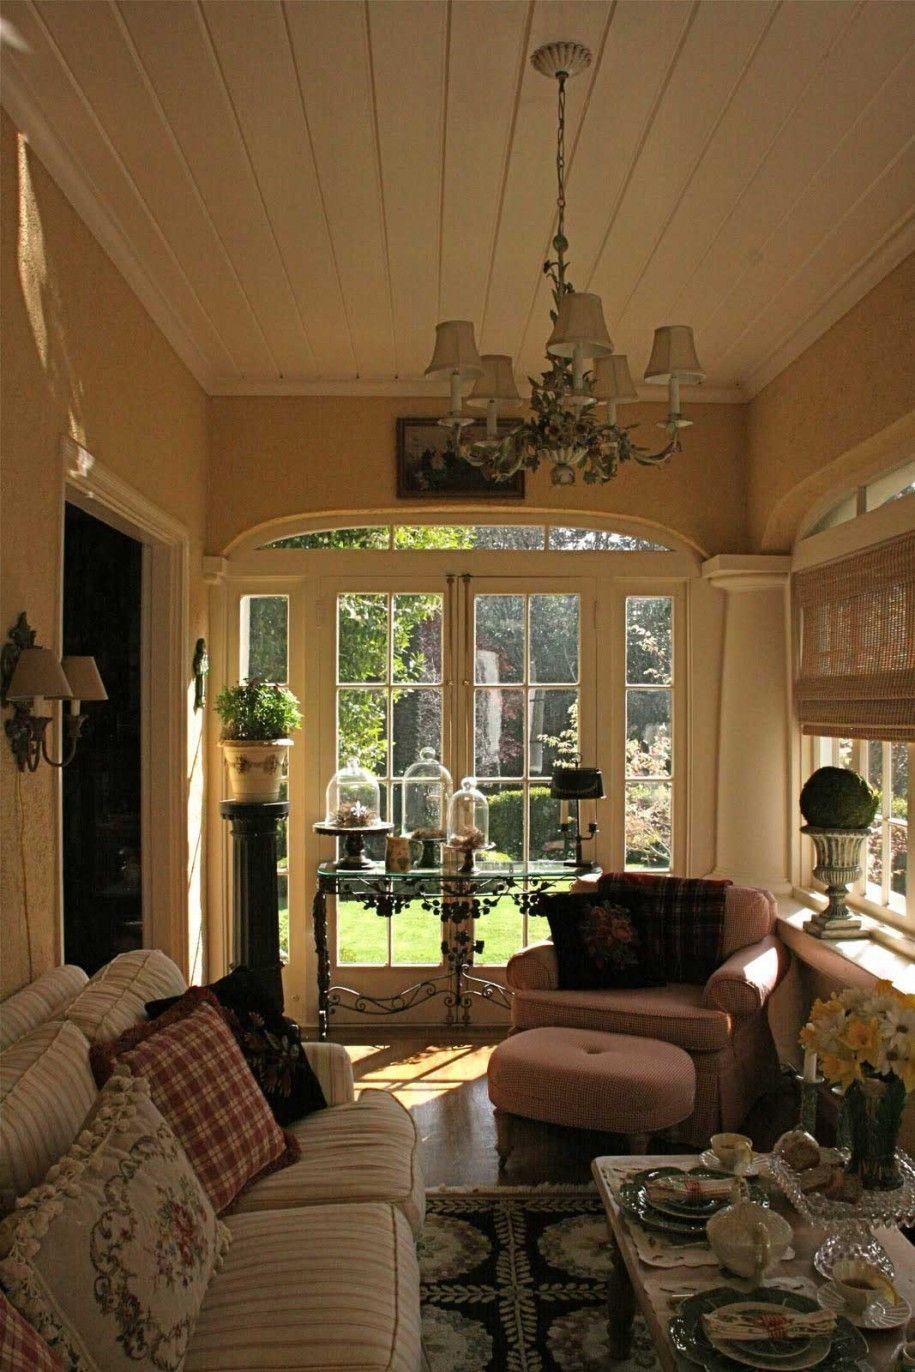 House Design Ideas Inspiration Pictures: Sunroom Ideas: Health And Attractive Design: Classic Sunroom Ideas